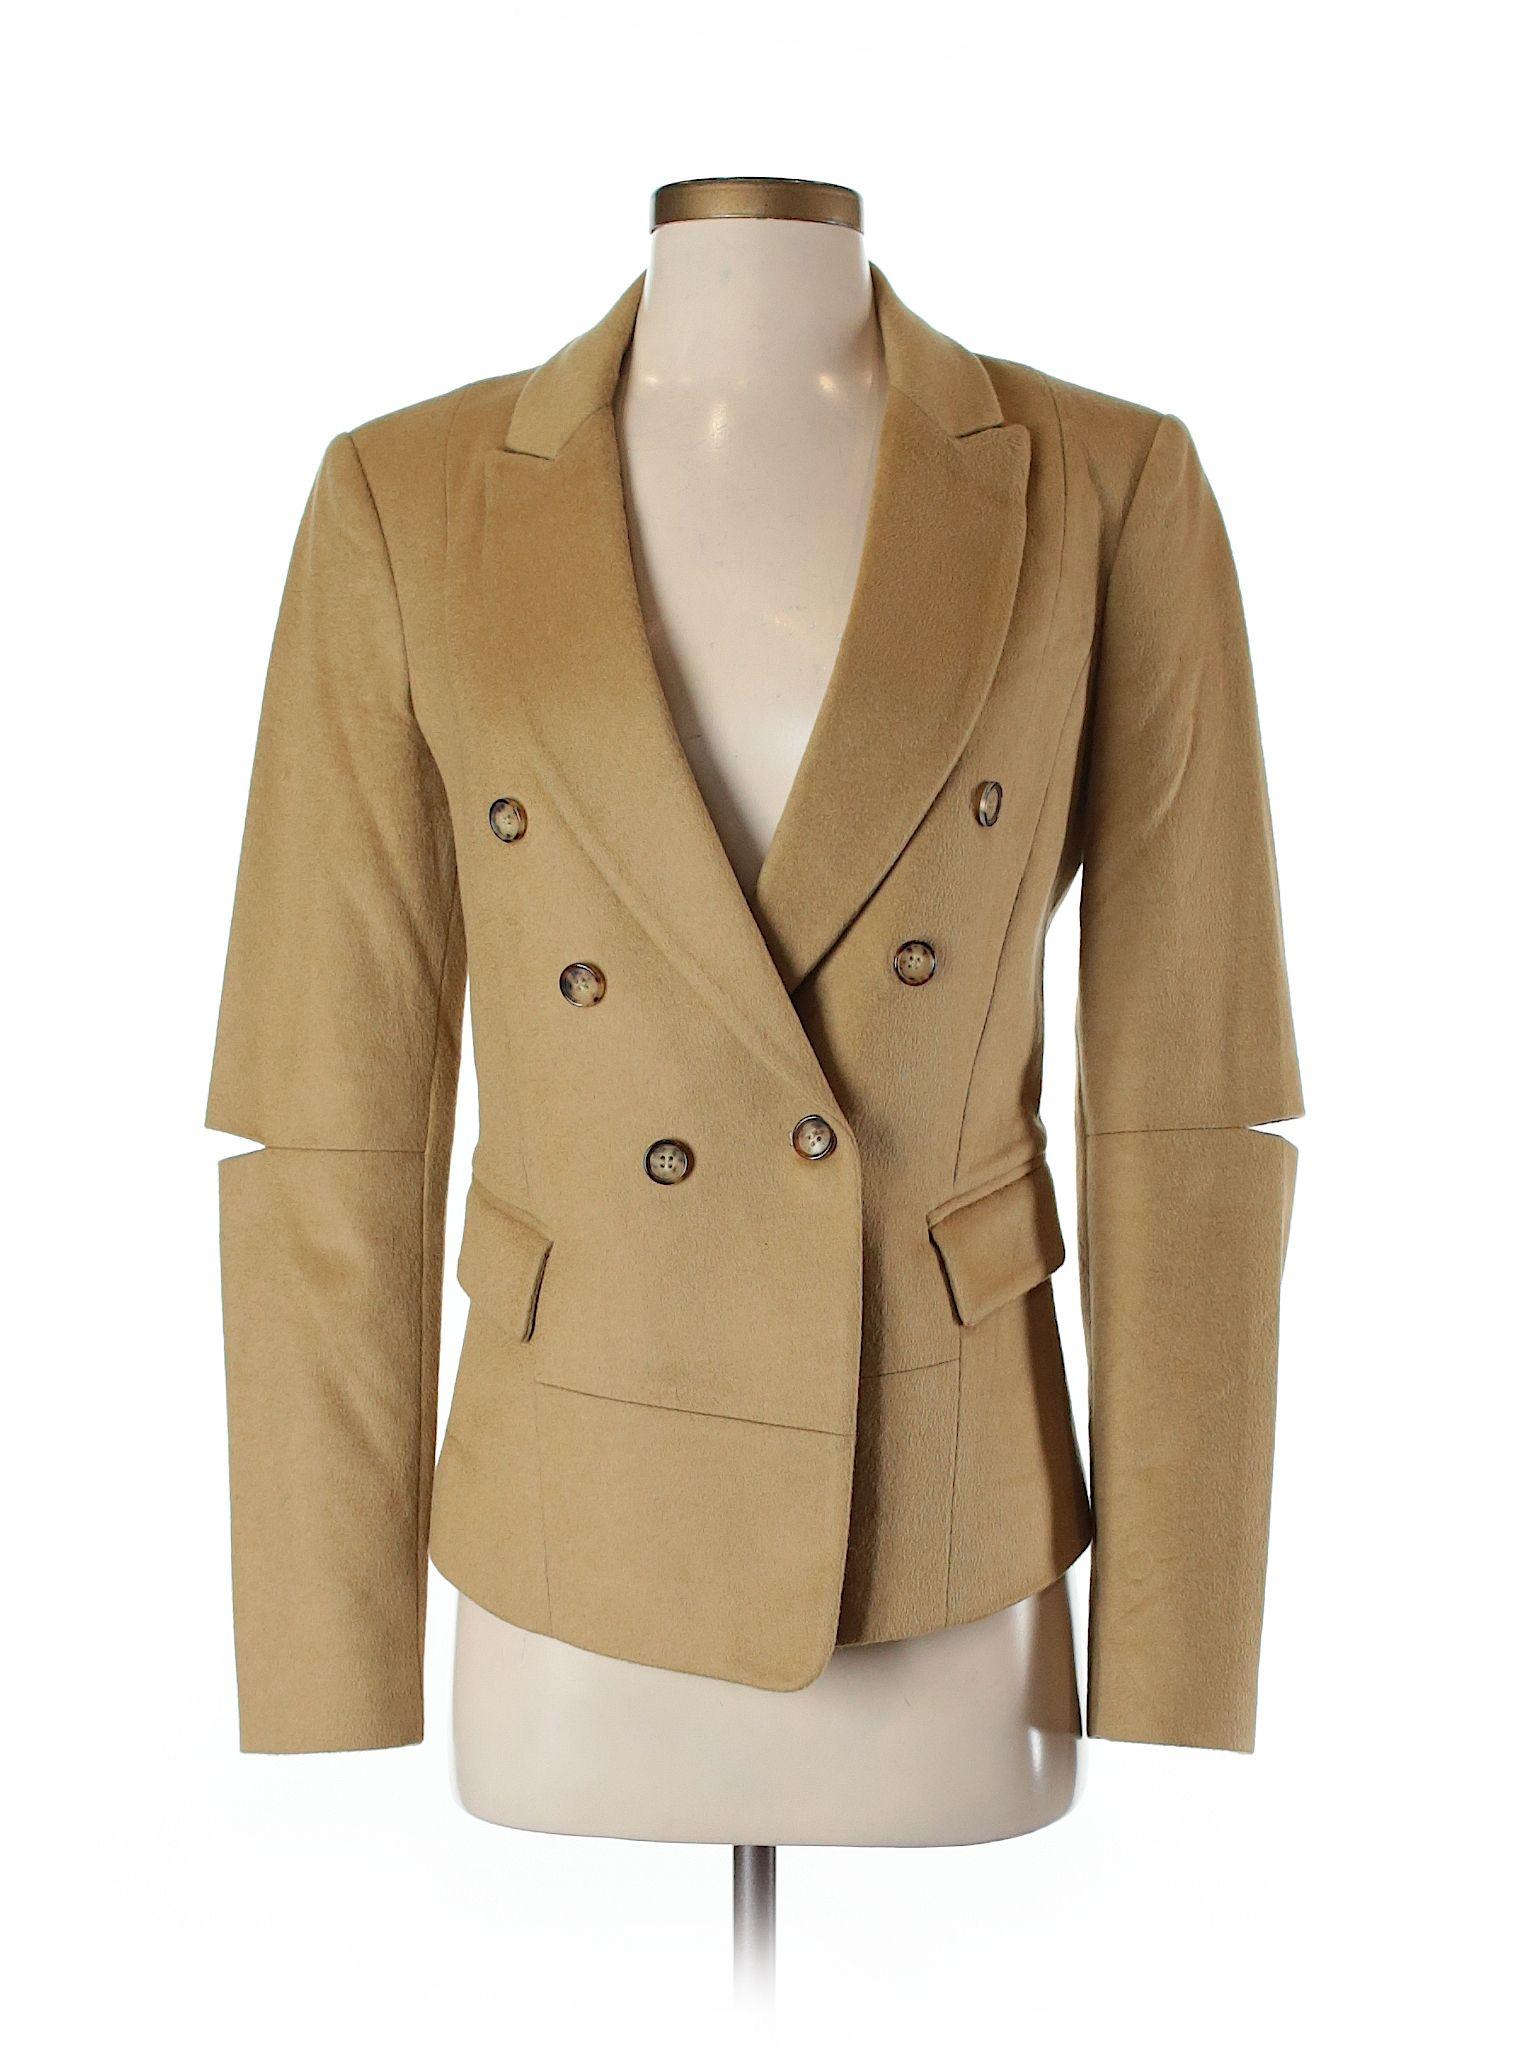 Michael Kors Tan Wool Blazer Size 4 85 Off Blazer Wool Blazer Outerwear Jackets [ 2048 x 1536 Pixel ]